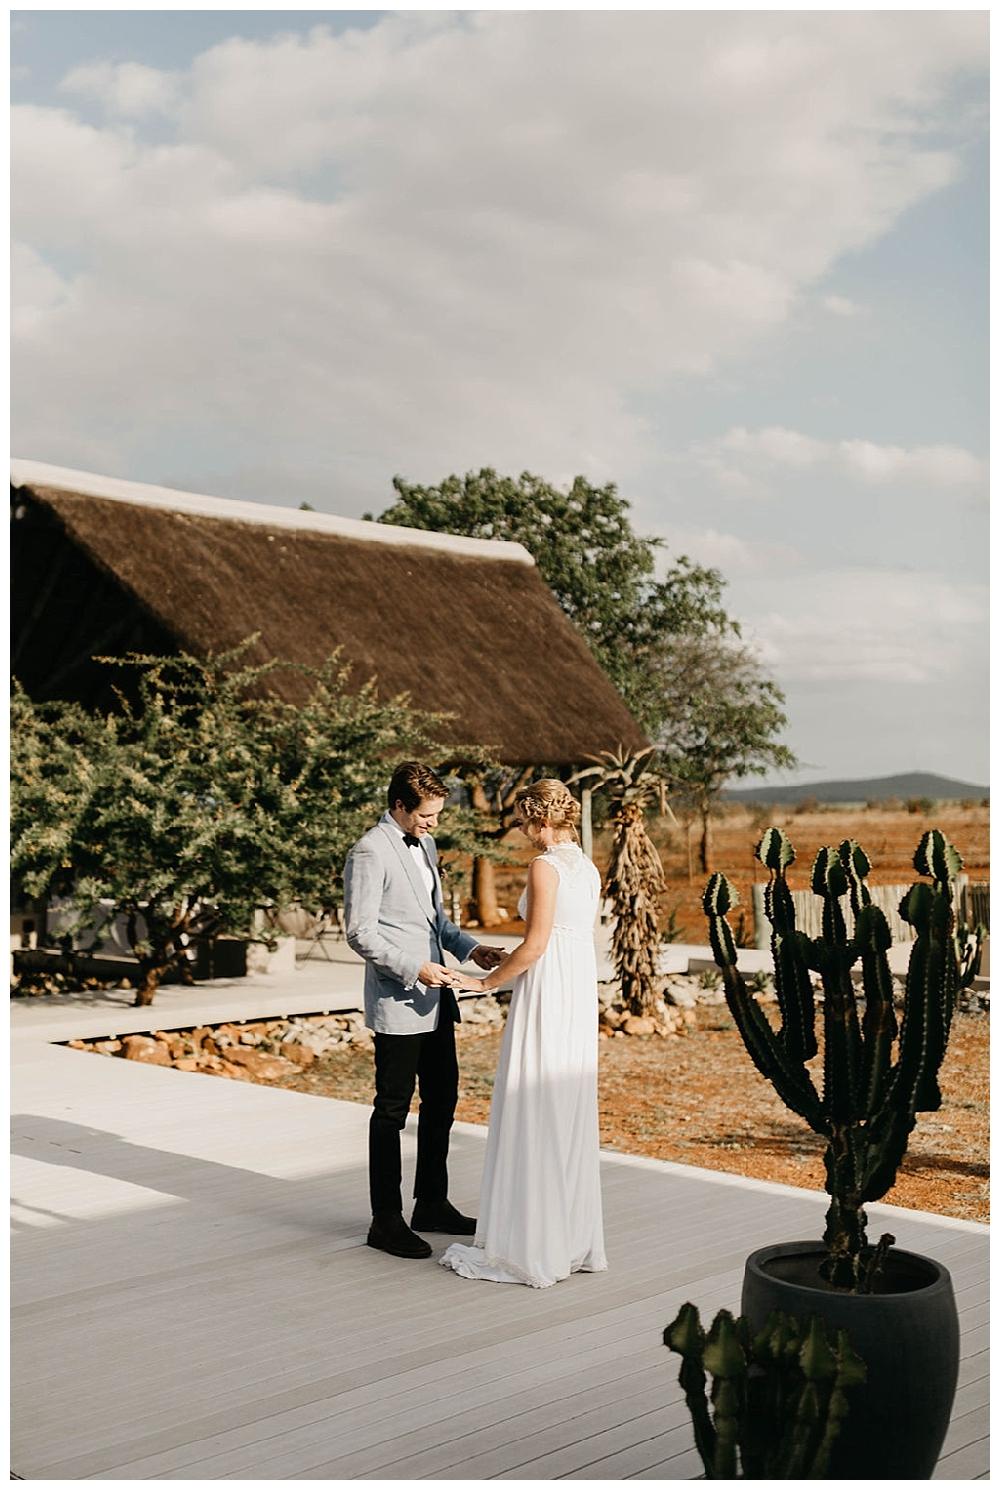 christinakarstphotography_southafricaelopement-313.jpg